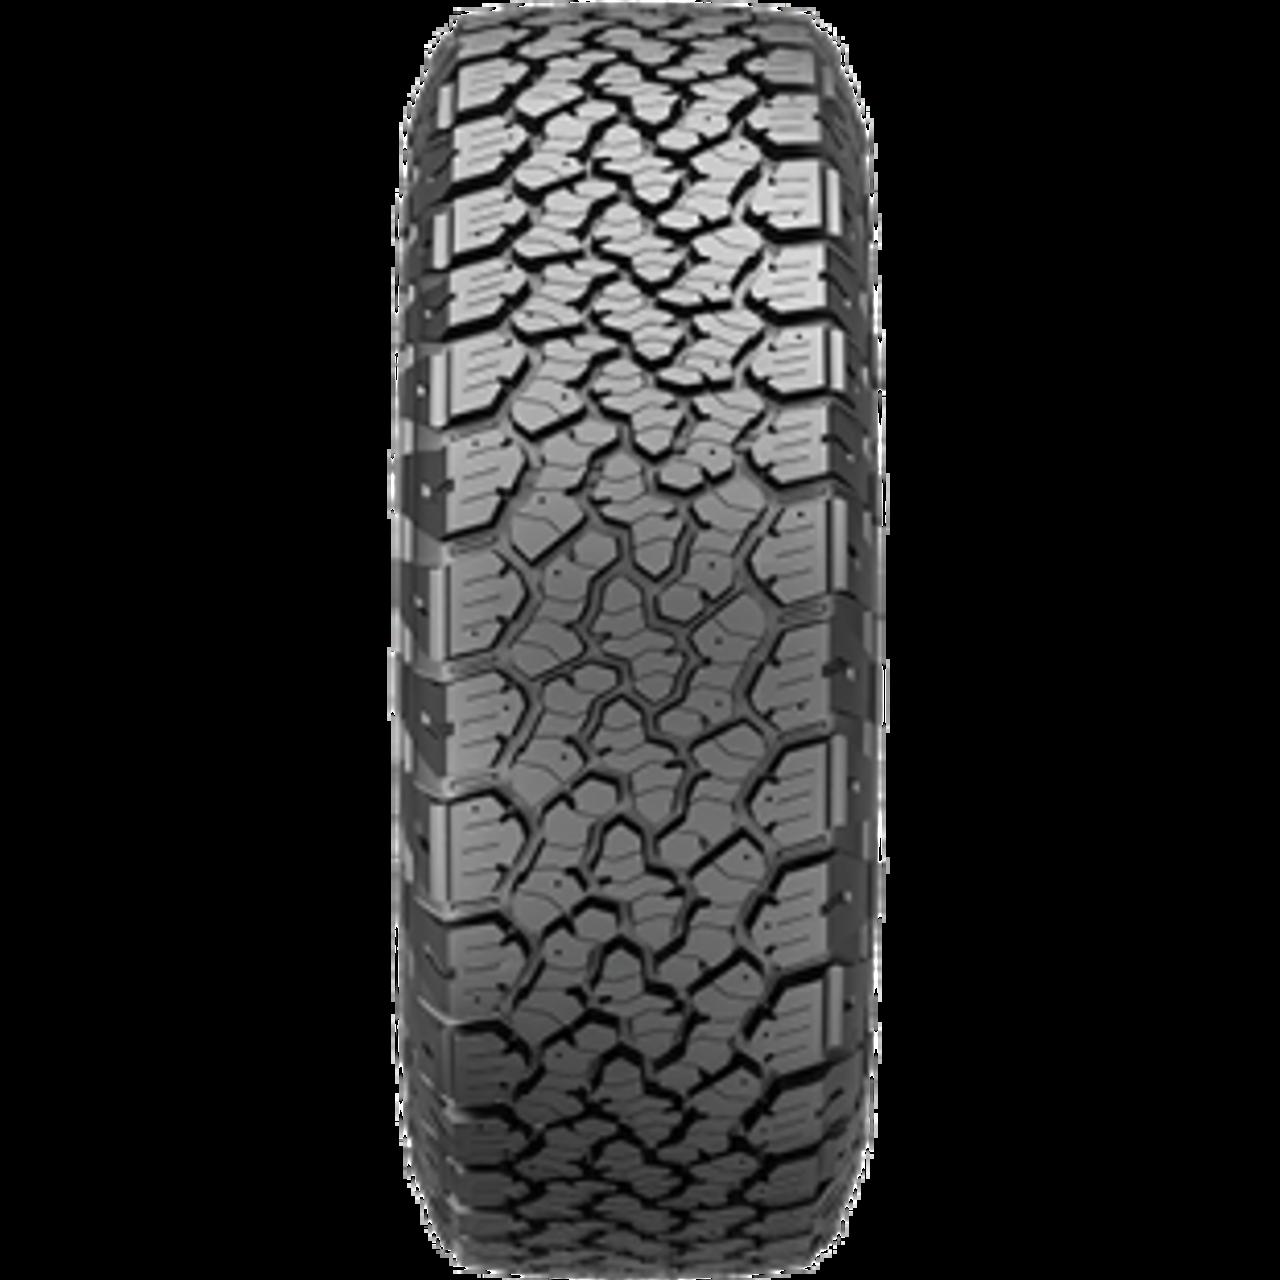 New Tire 275 65 20 General Grabber ATX RWL 10ply LT275/65R20 126S 50,000mile All Terrain